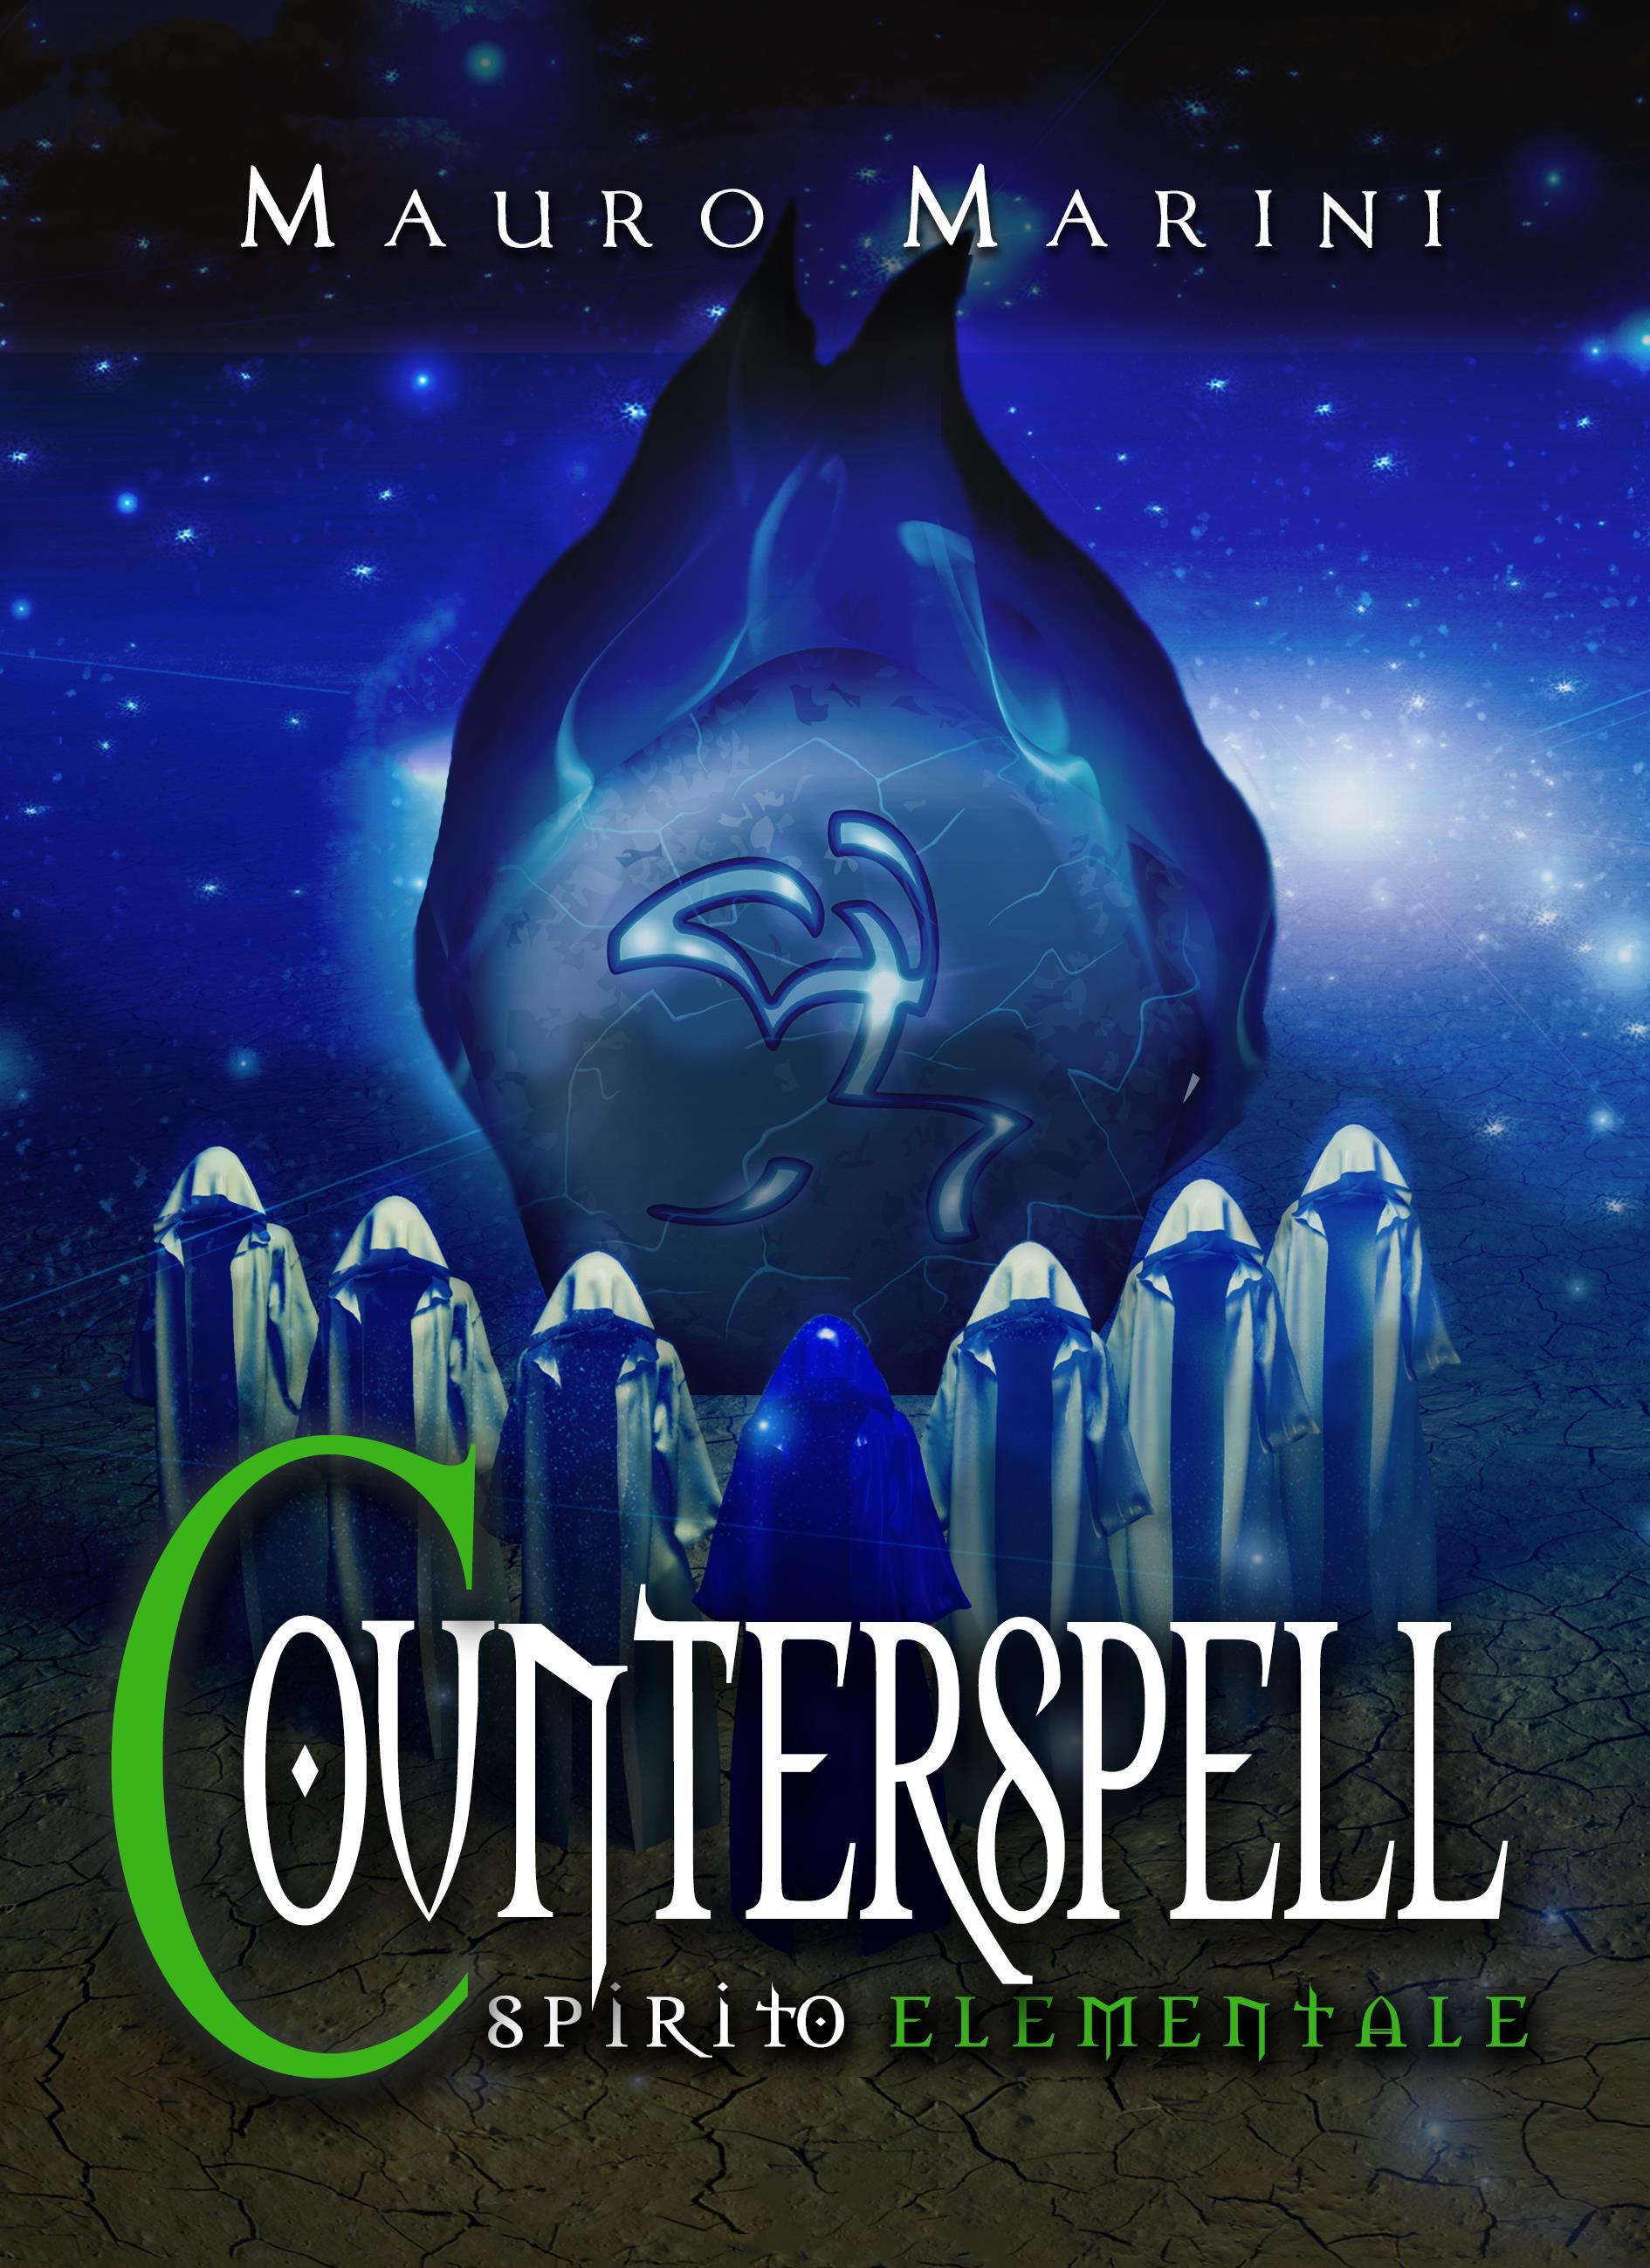 Counterspell - Spirito Elementale